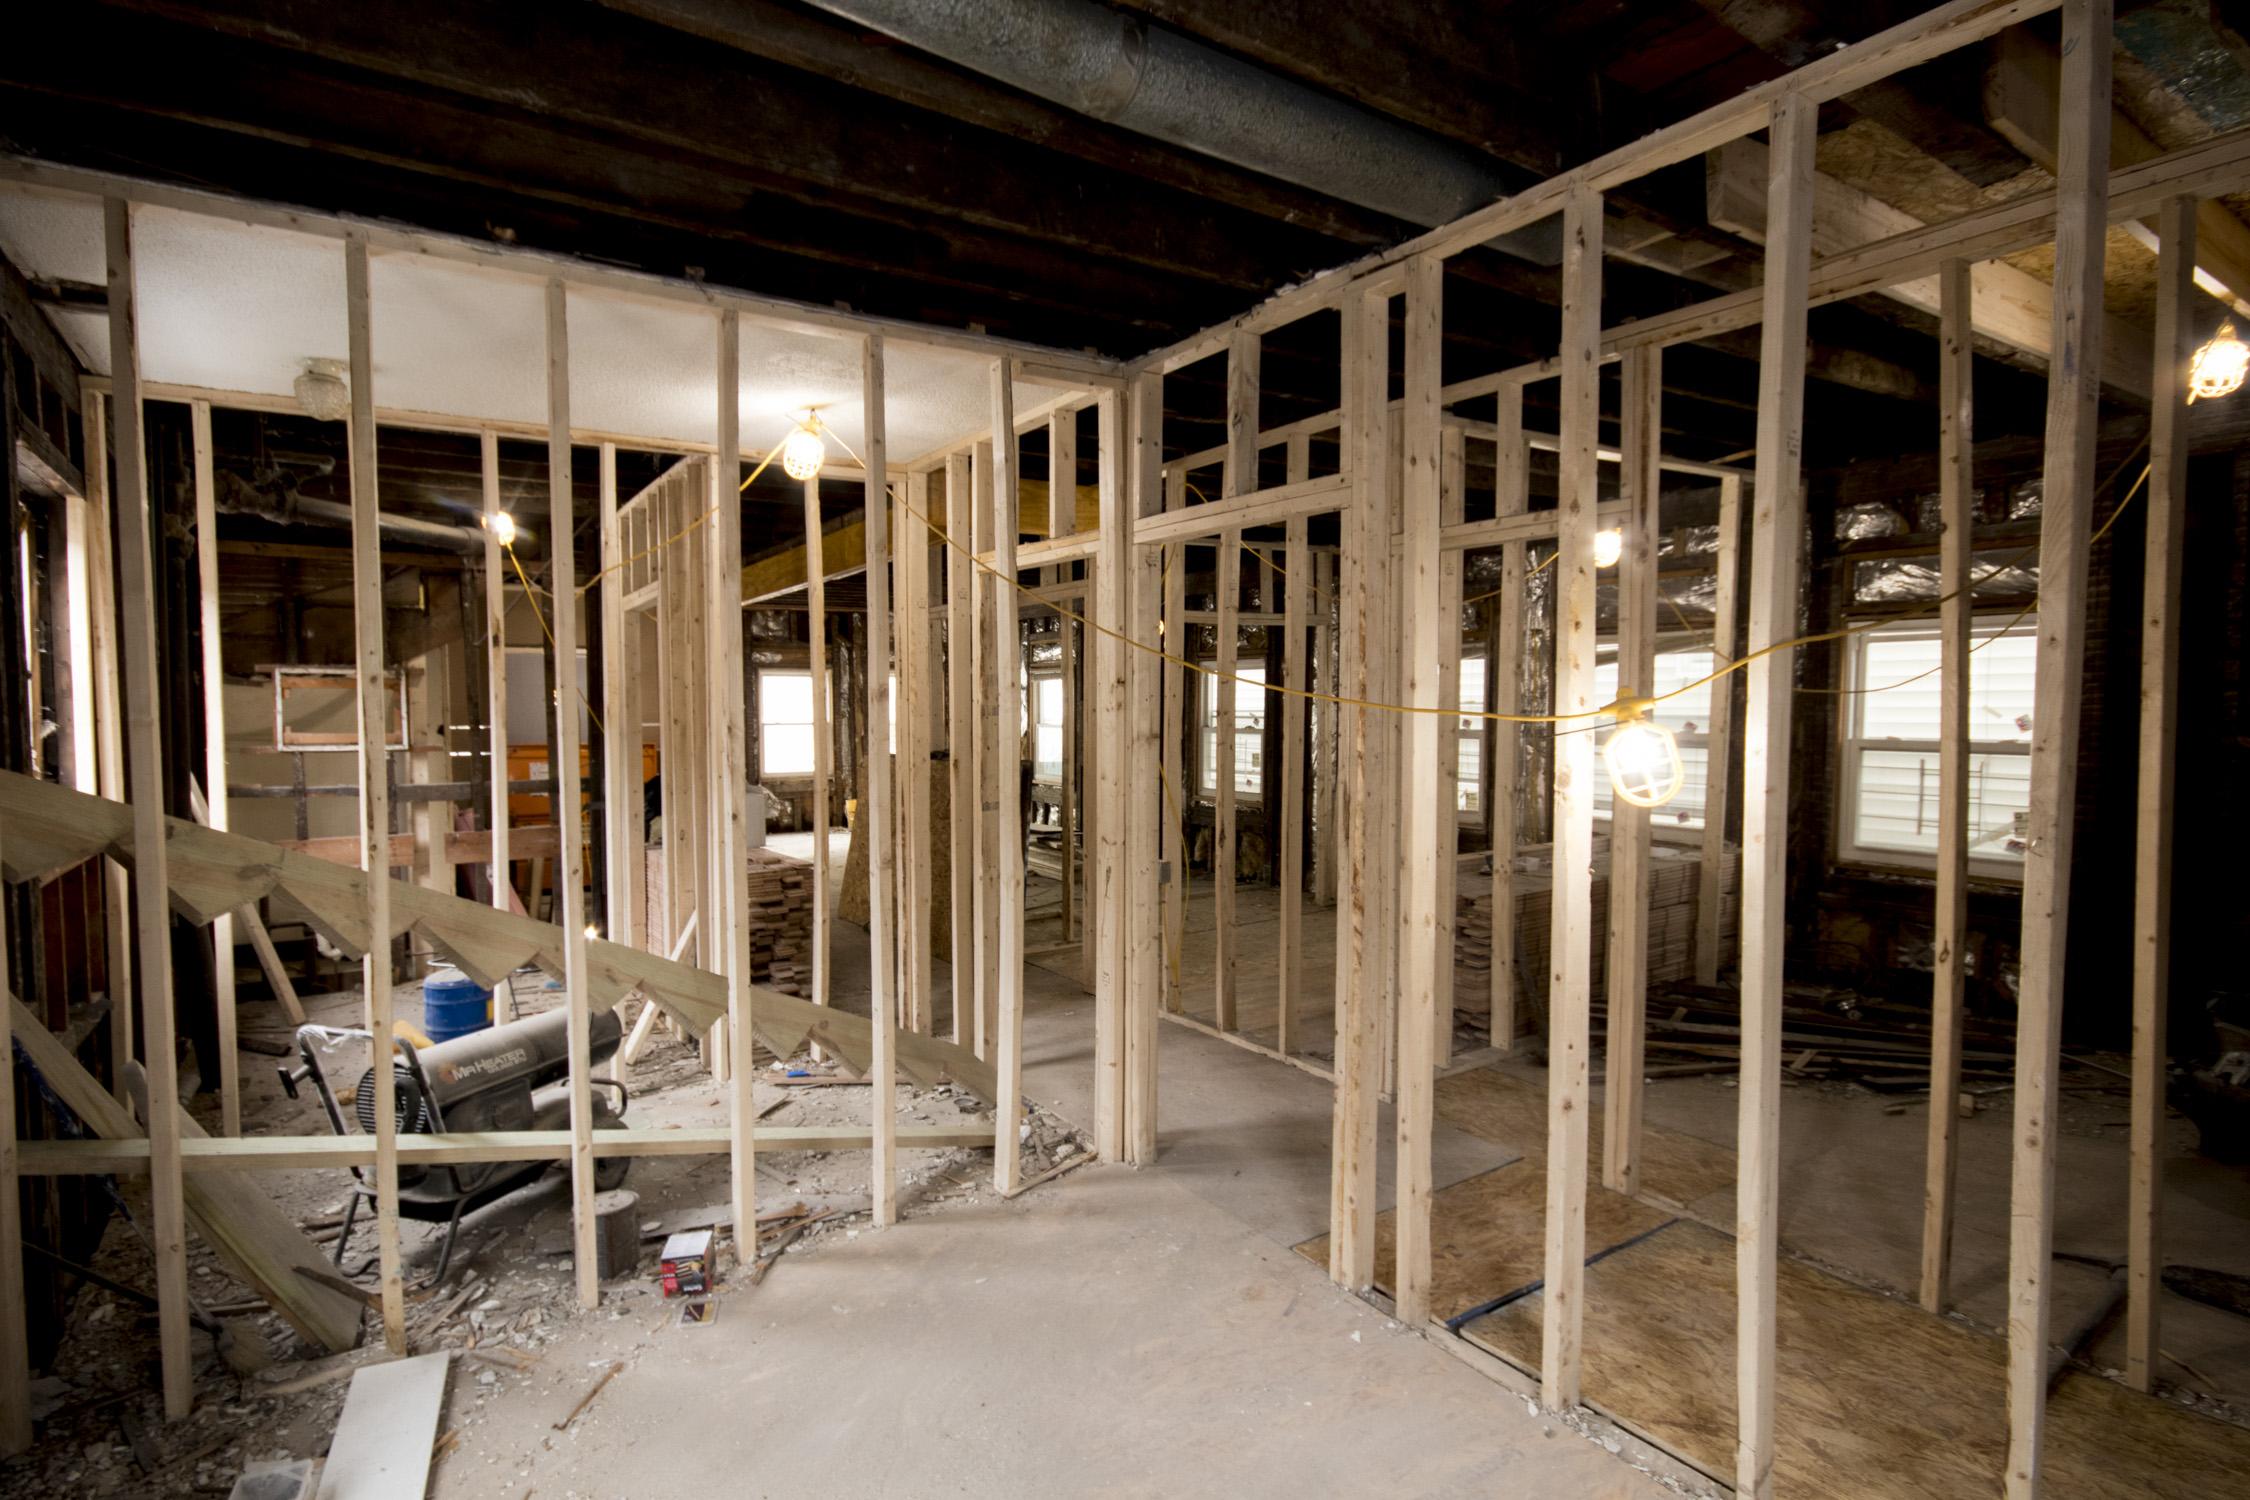 25 Darling St Boston General Contractors P Northeast Contractors_83